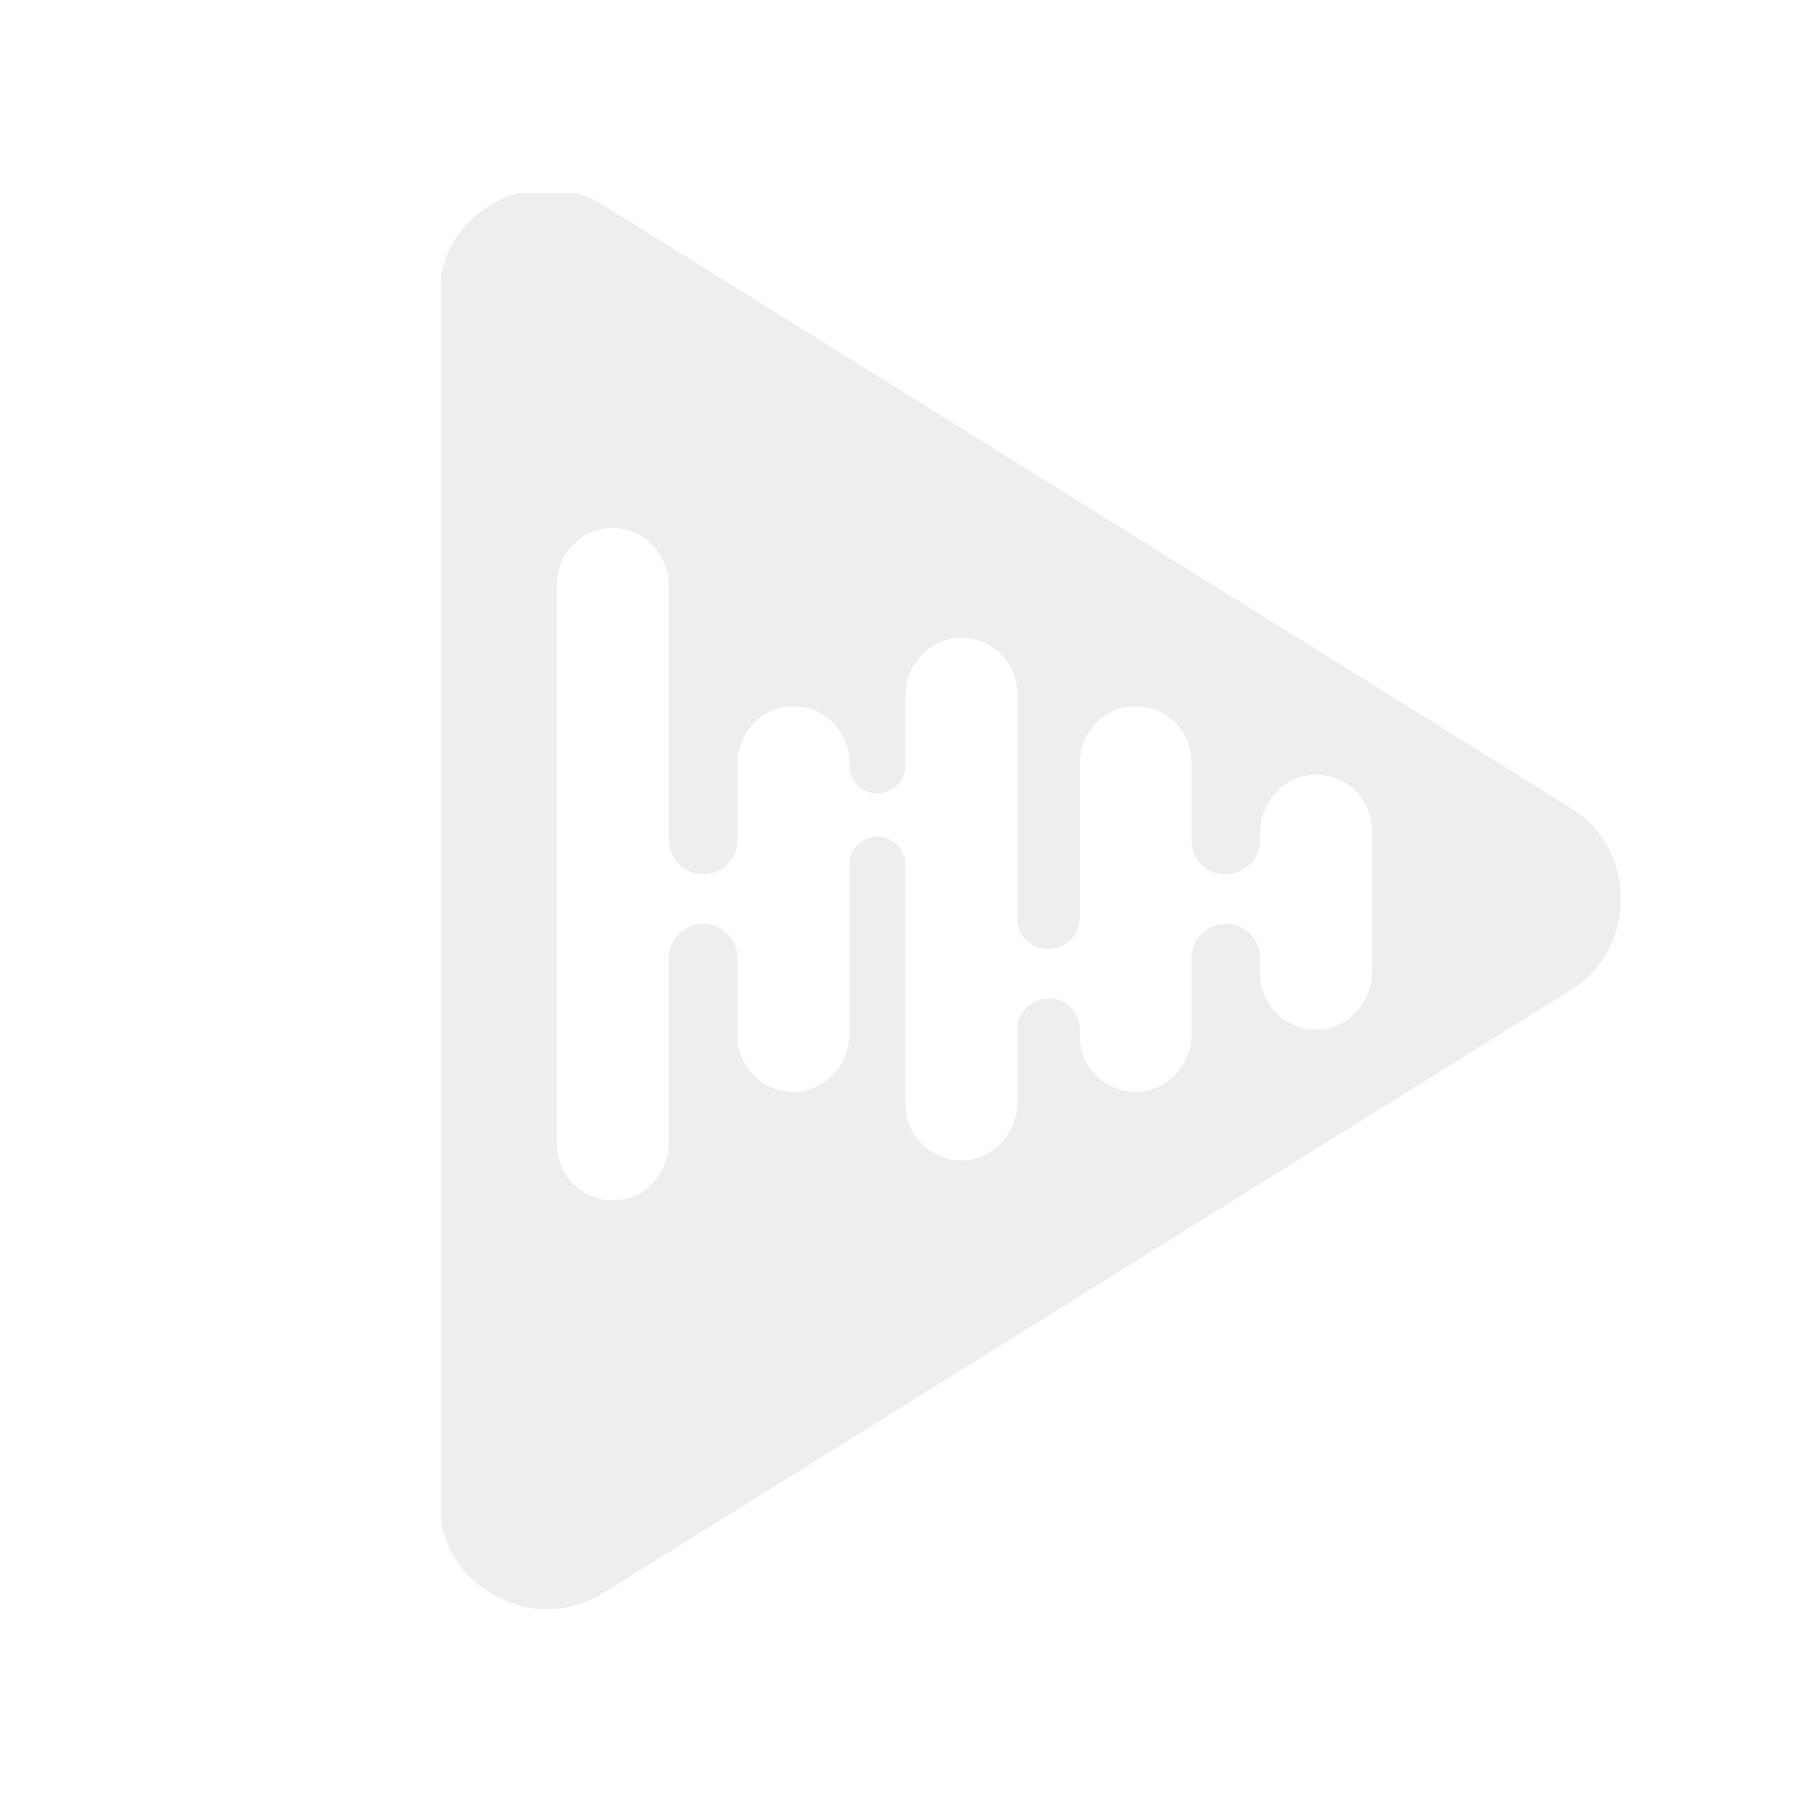 Phonocar VM267 - Biltilpasset ryggekamera